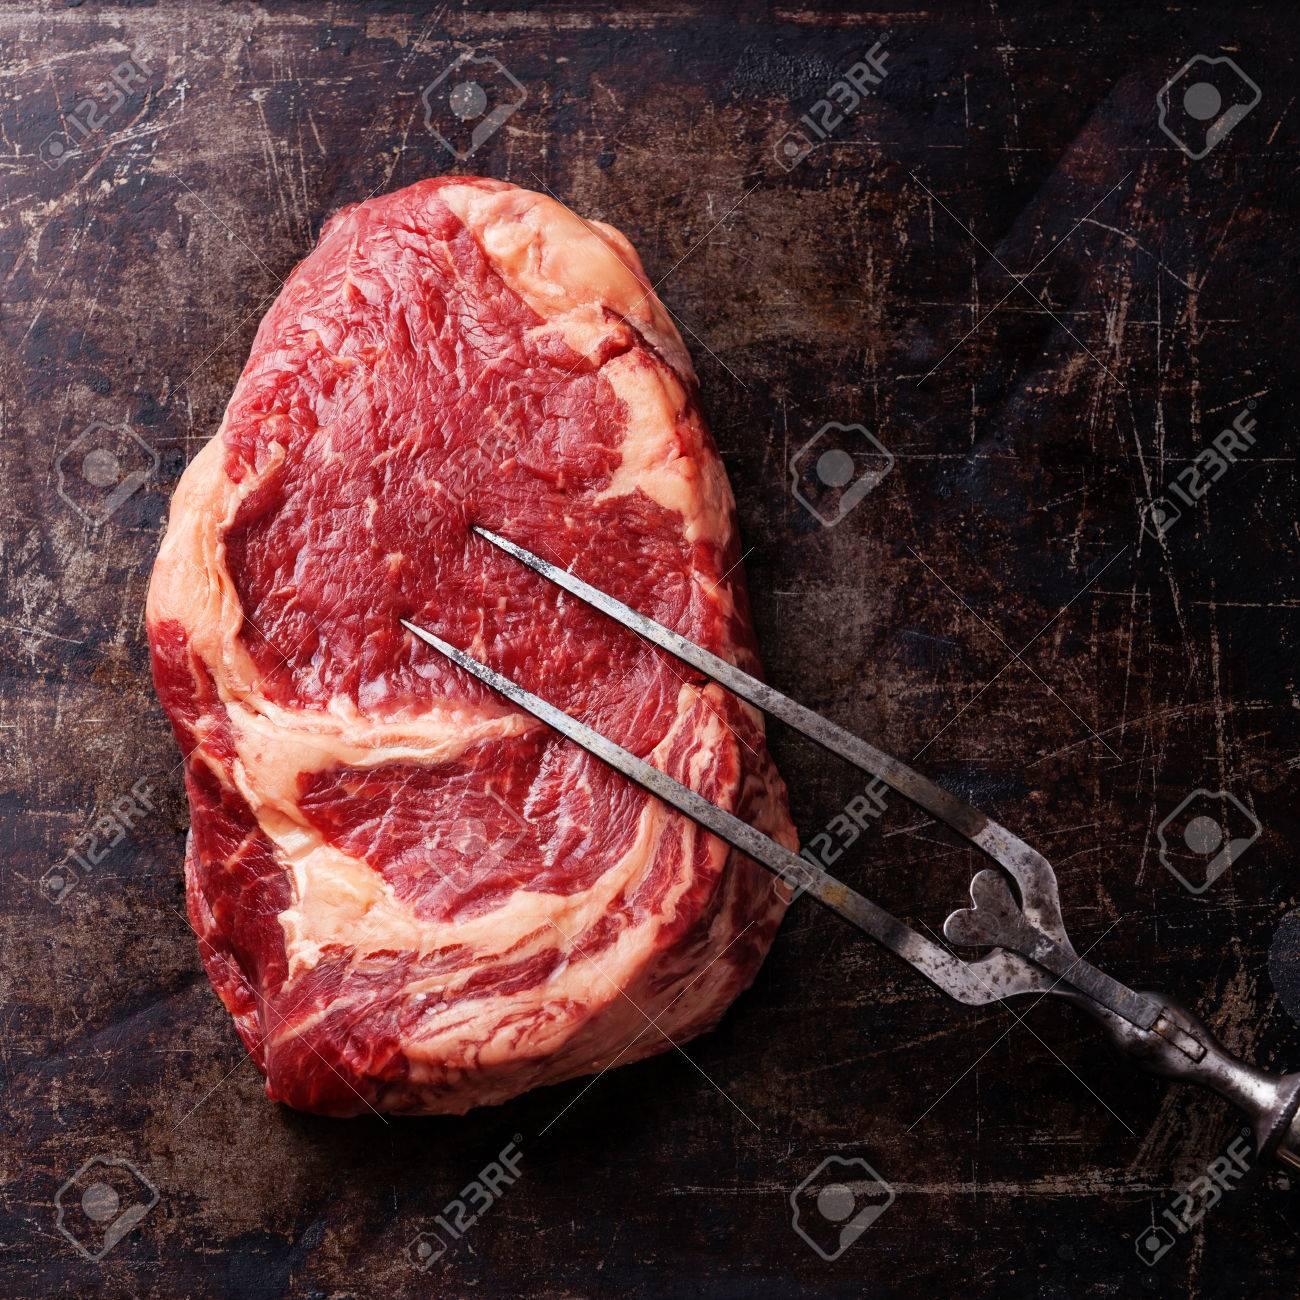 Темное мясо 4 dark meat 4 3 фотография